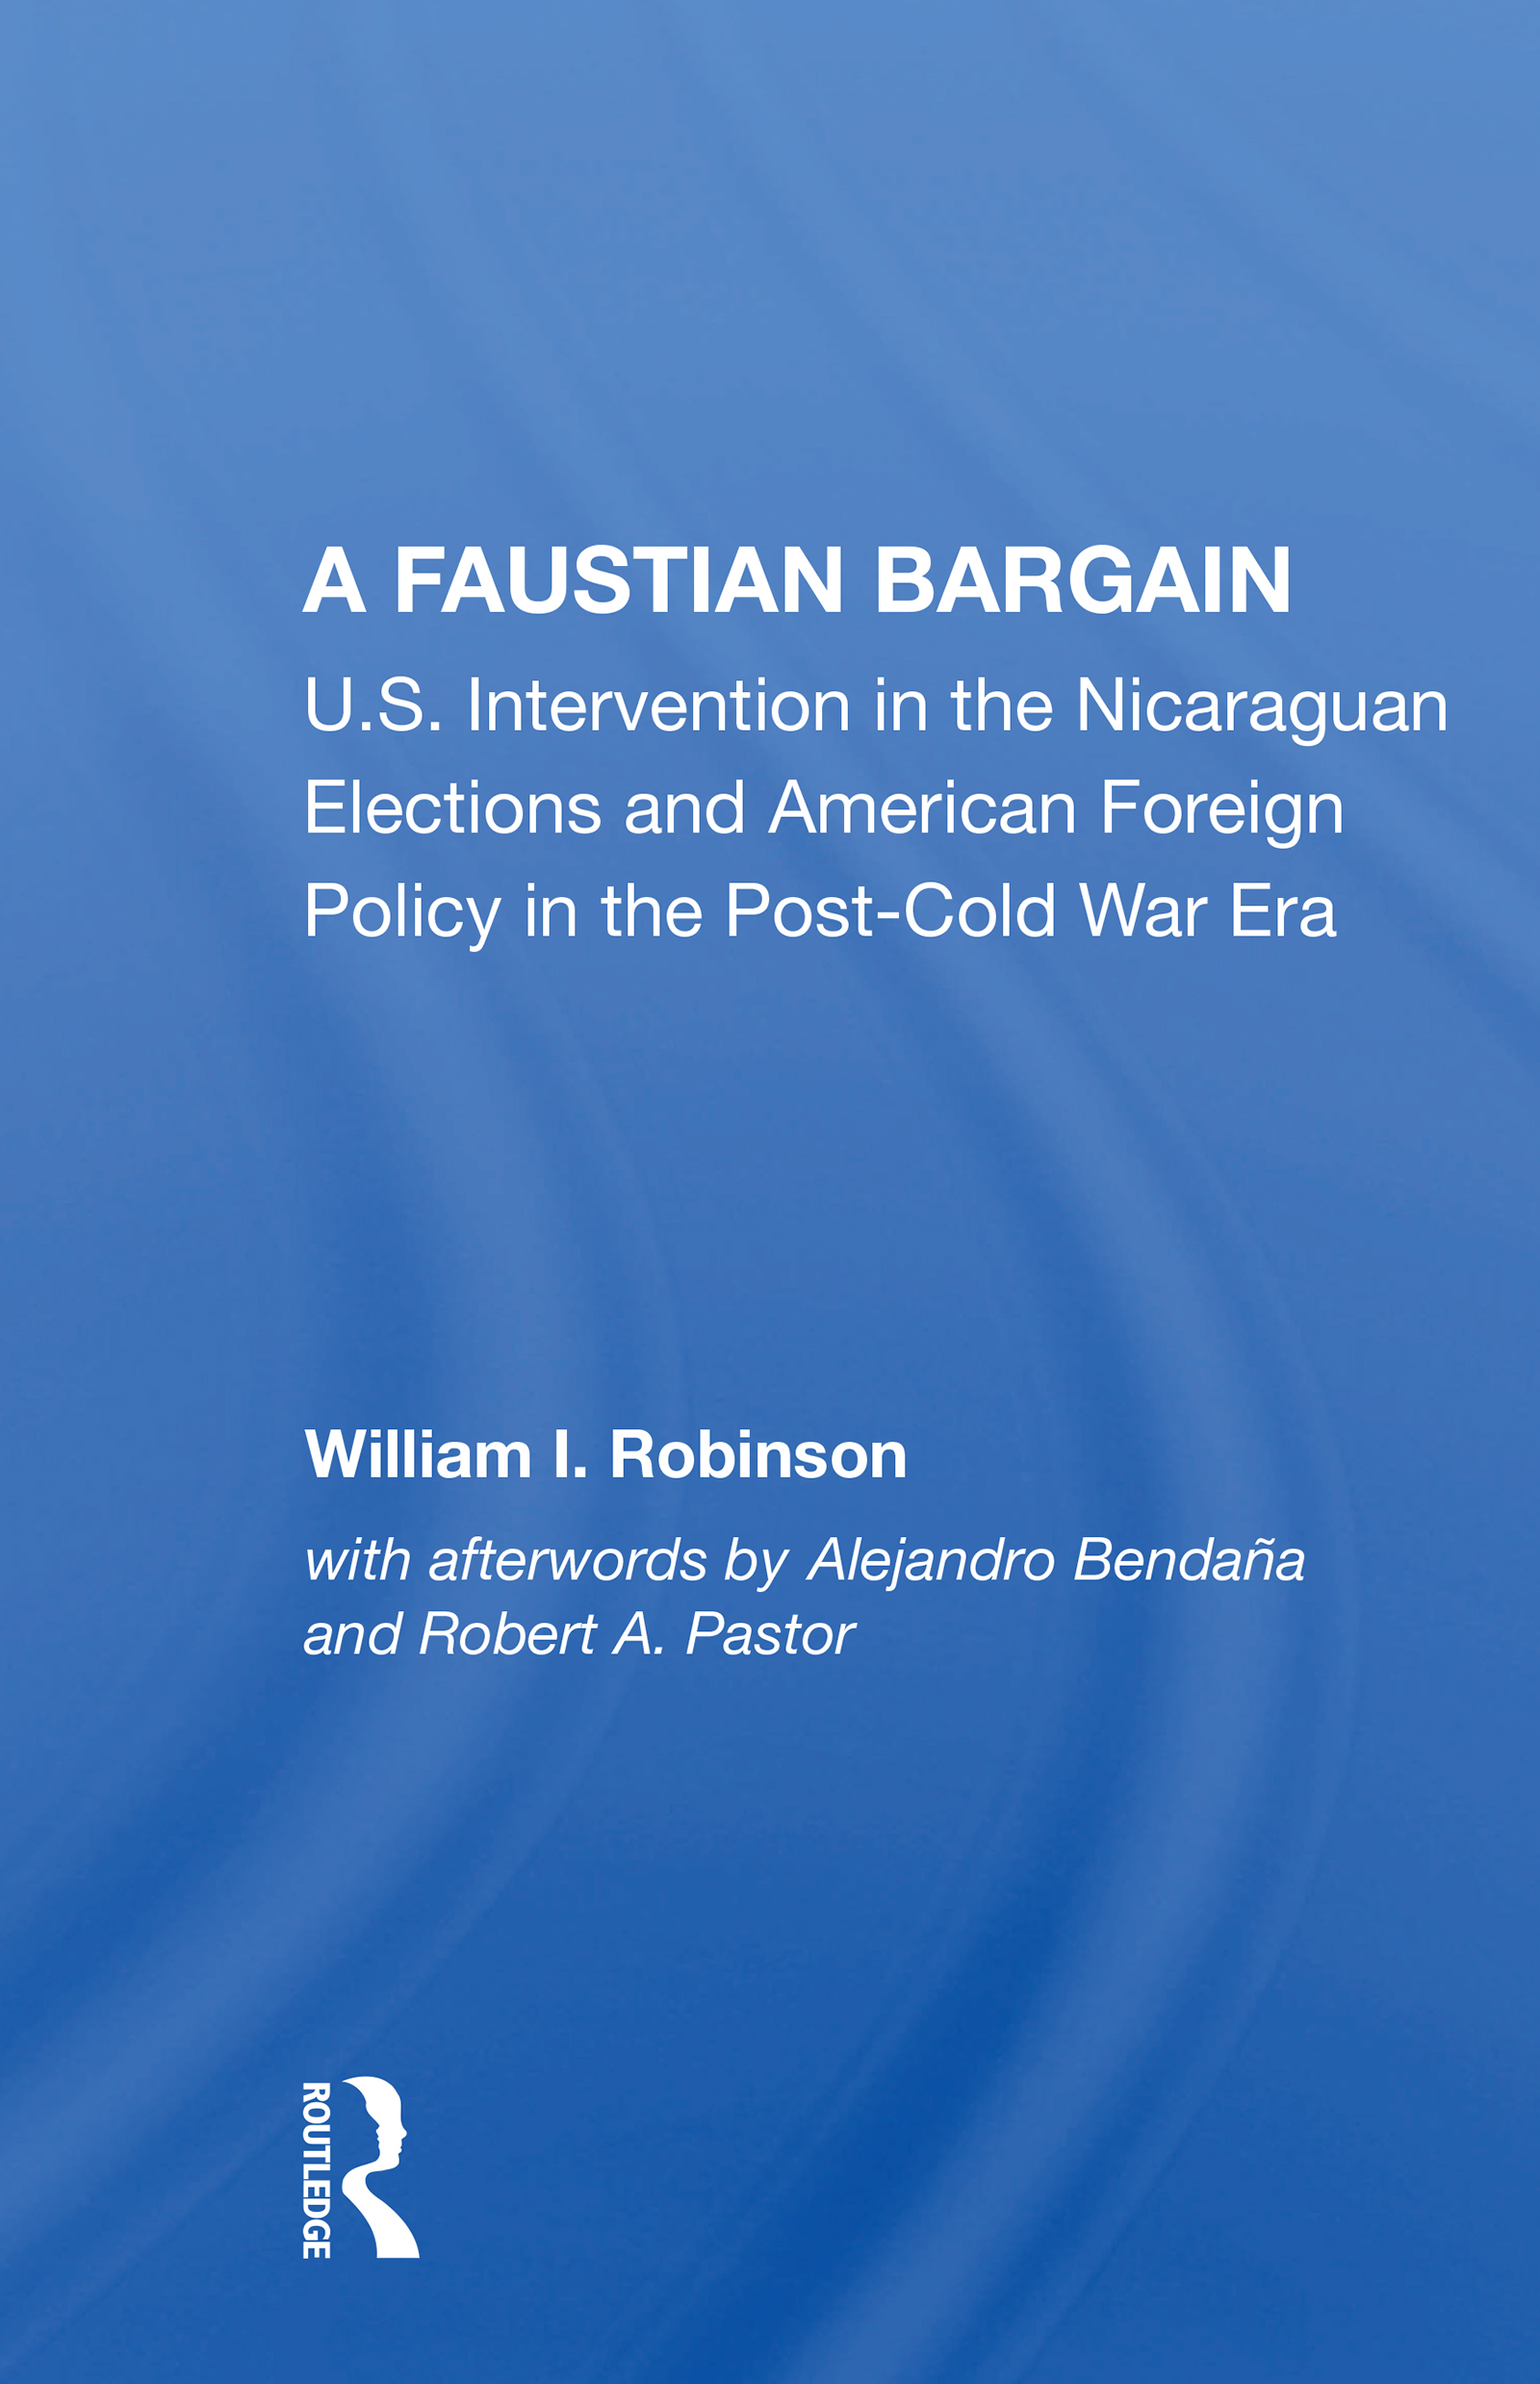 A Faustian Bargain